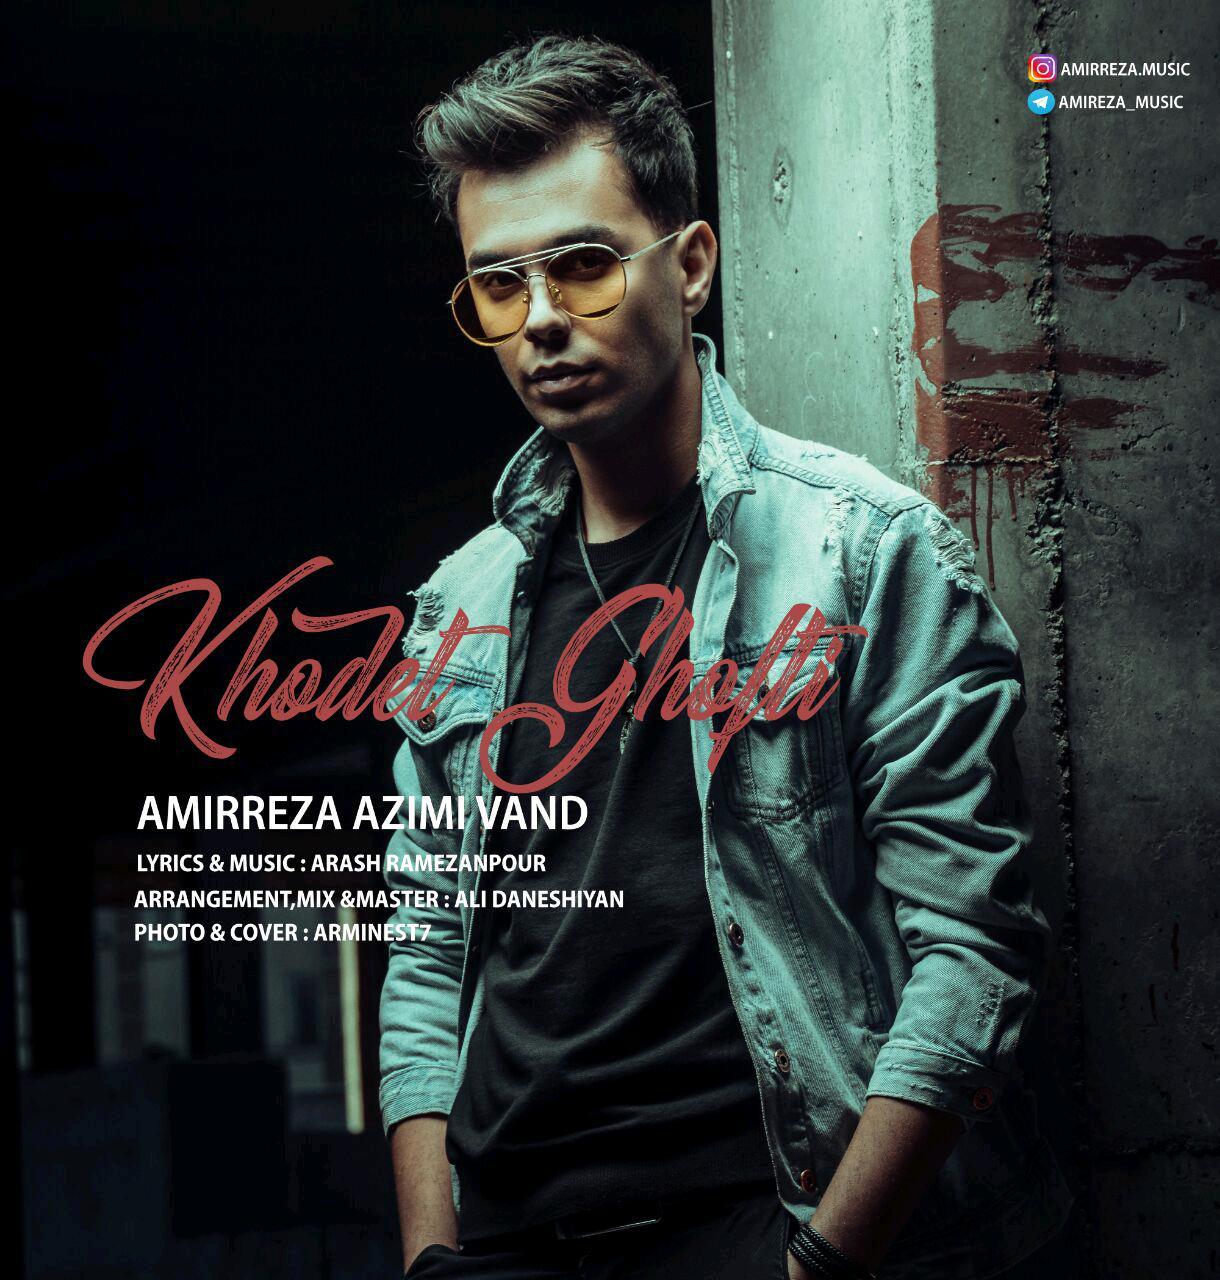 AmirReza Azimivand – Khodet Gofti